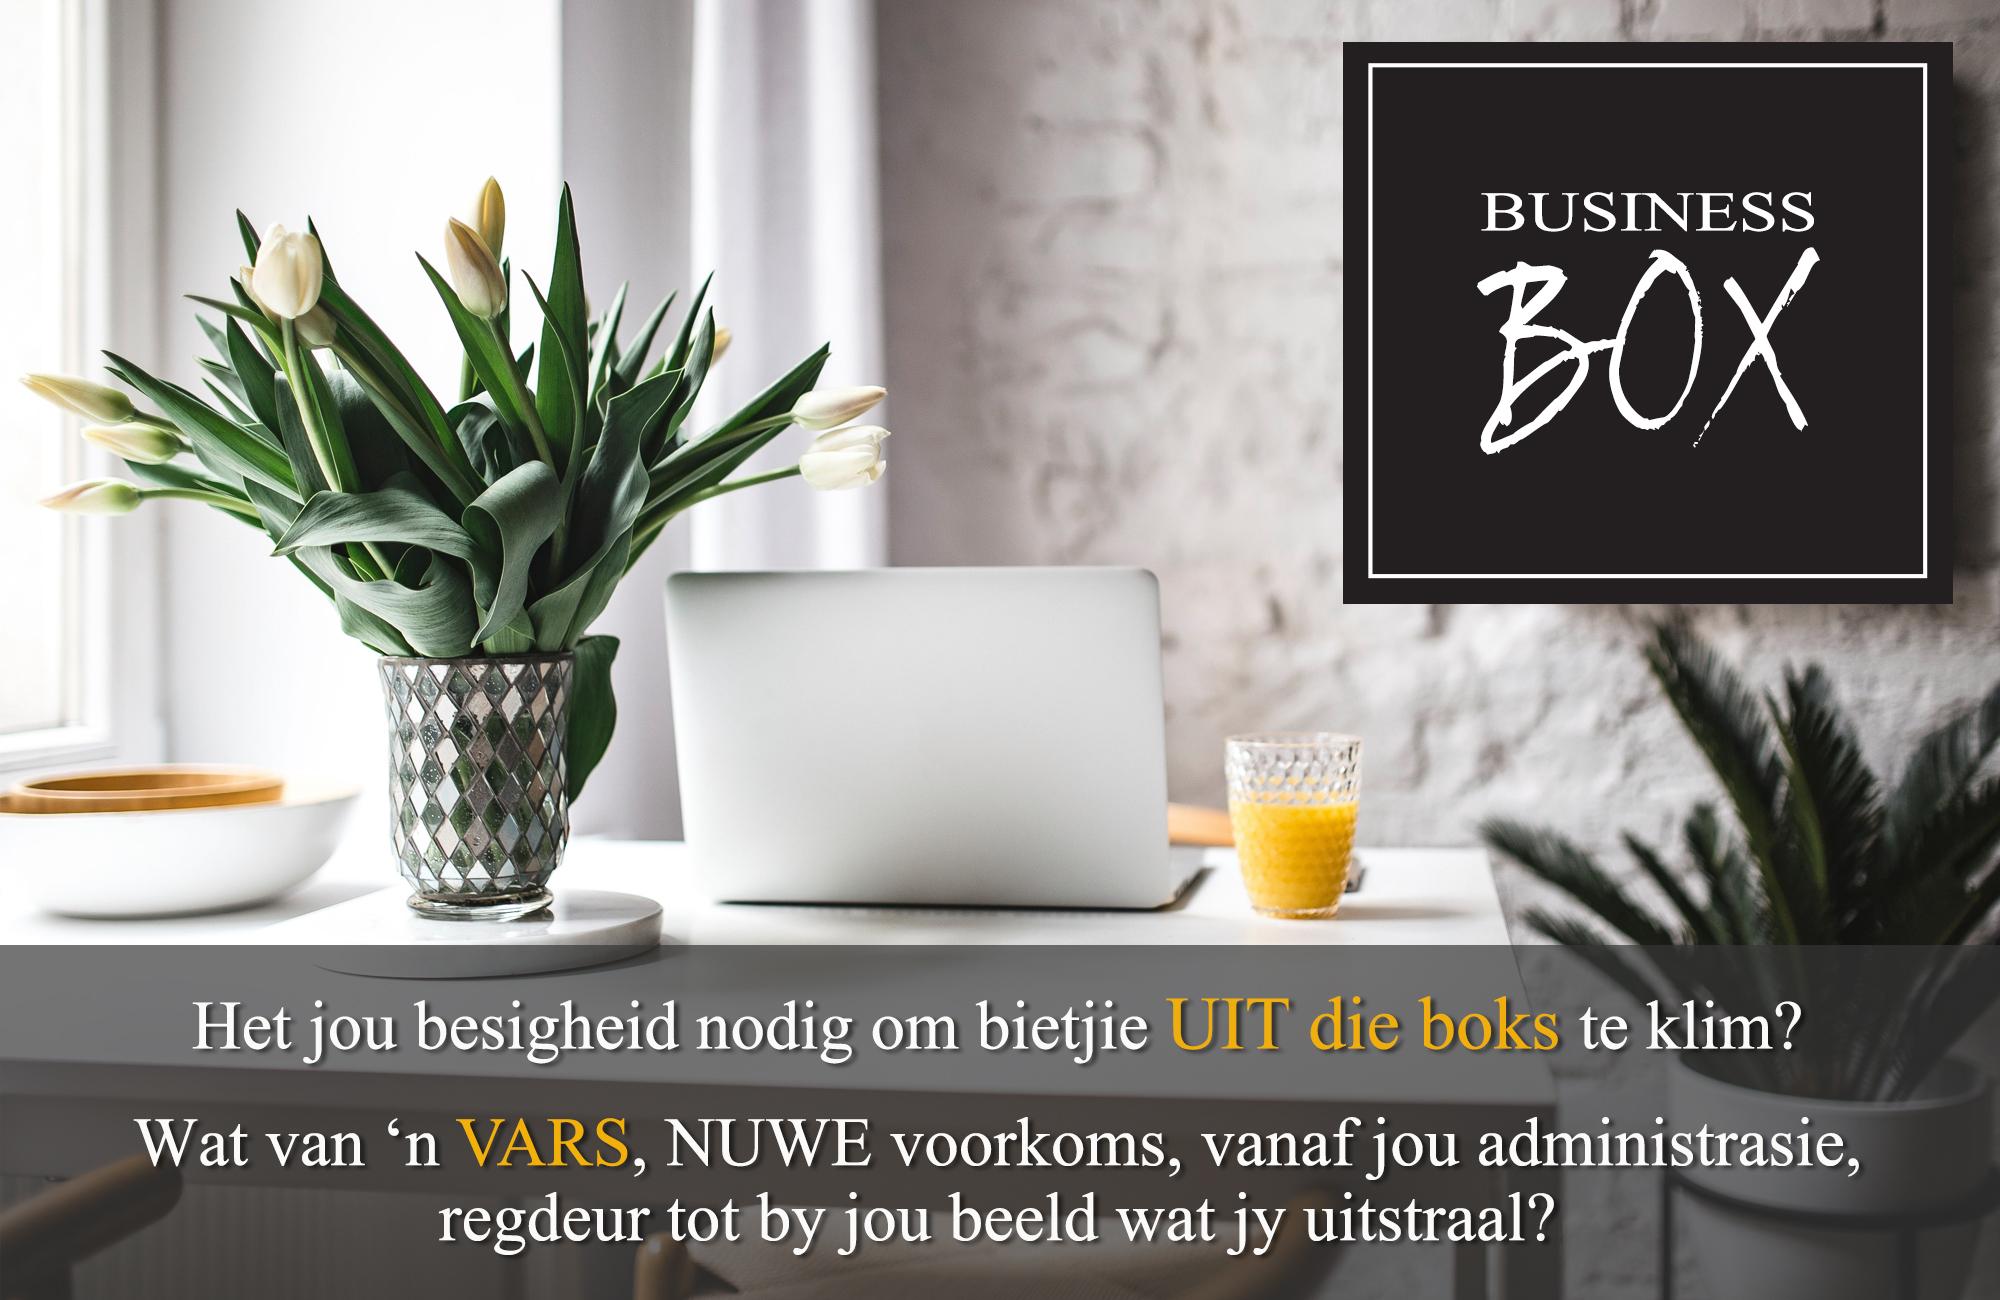 business box ad 2.jpg